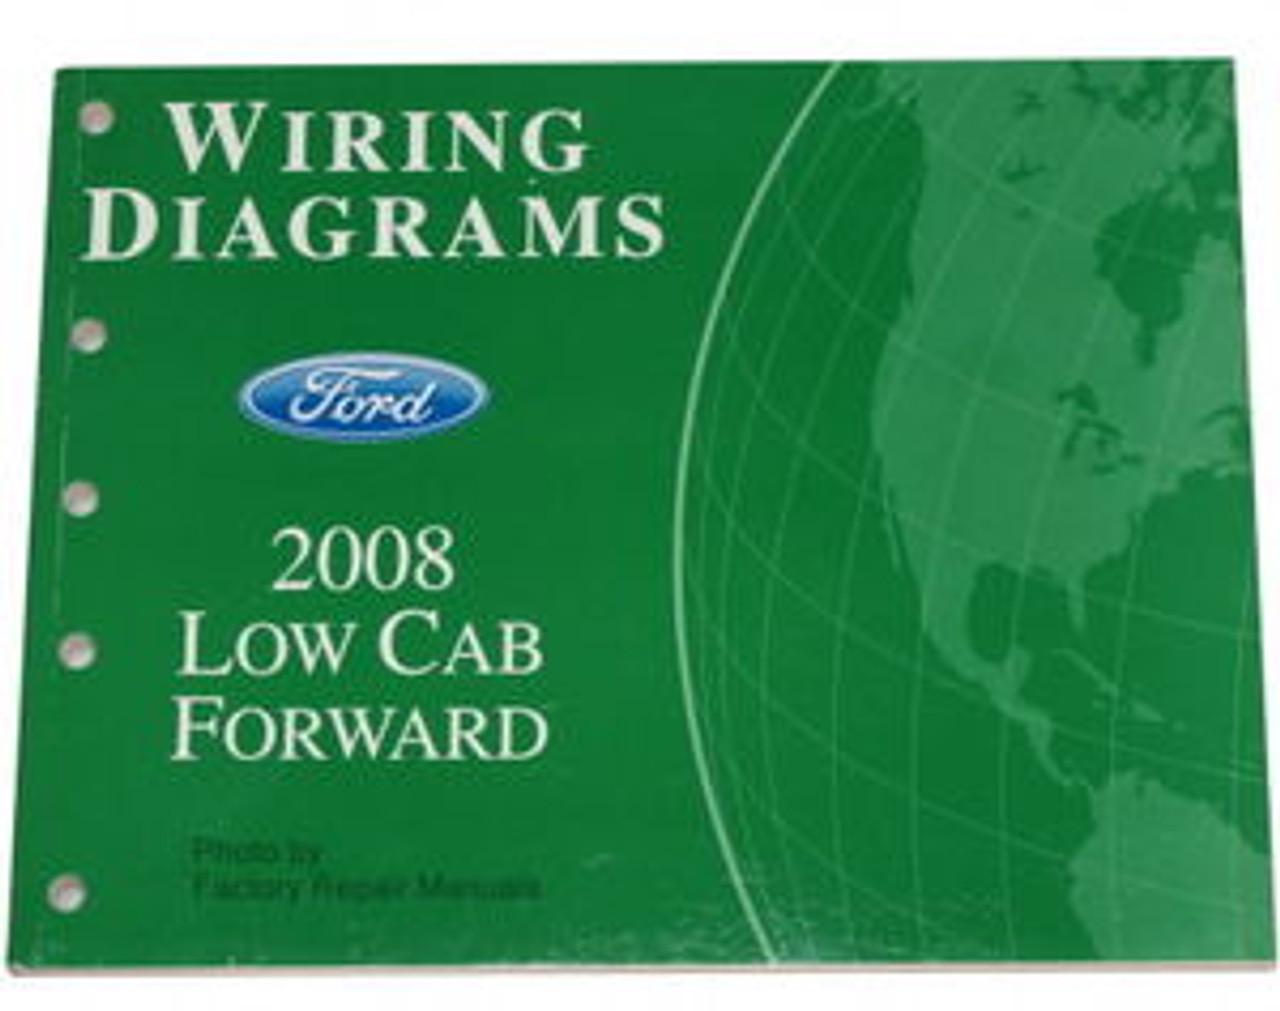 Wiring Diagram 1938 Ford Wiring Diagram Chevy Truck Wiring Diagram